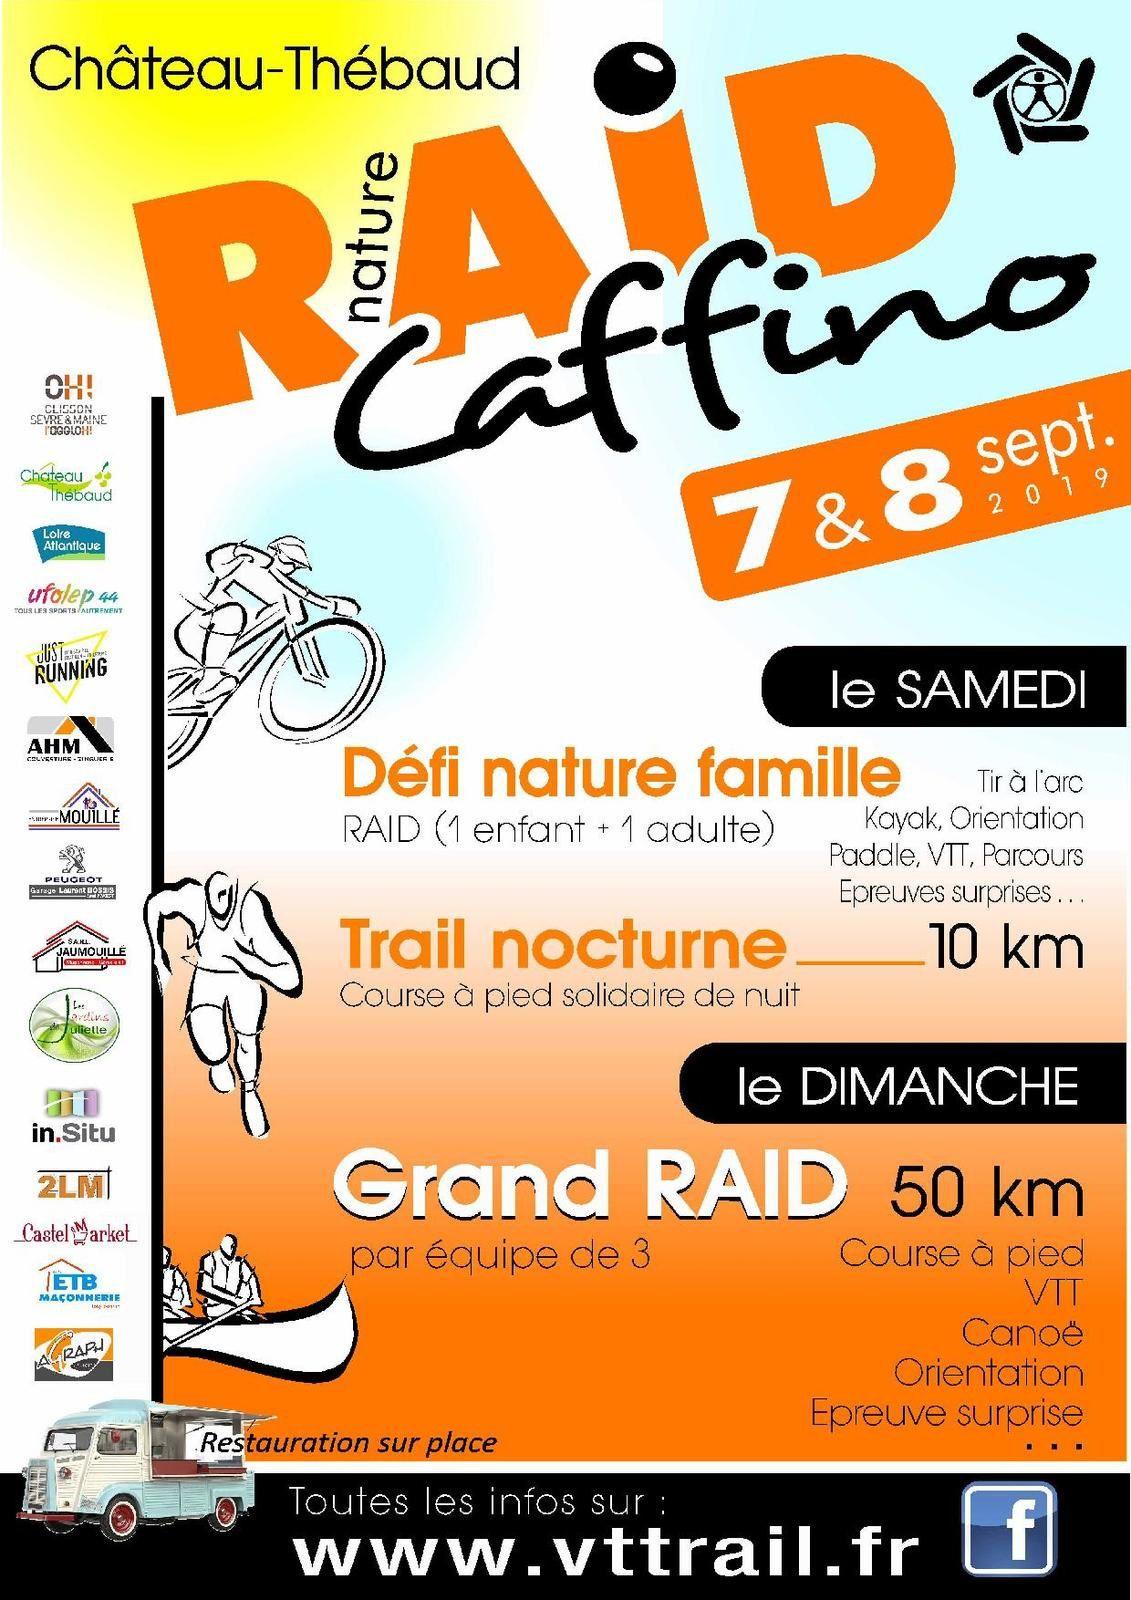 Calendrier Raid Multisport 2019.Raid Caffino 2019 Vttrail Chateau Thebaud